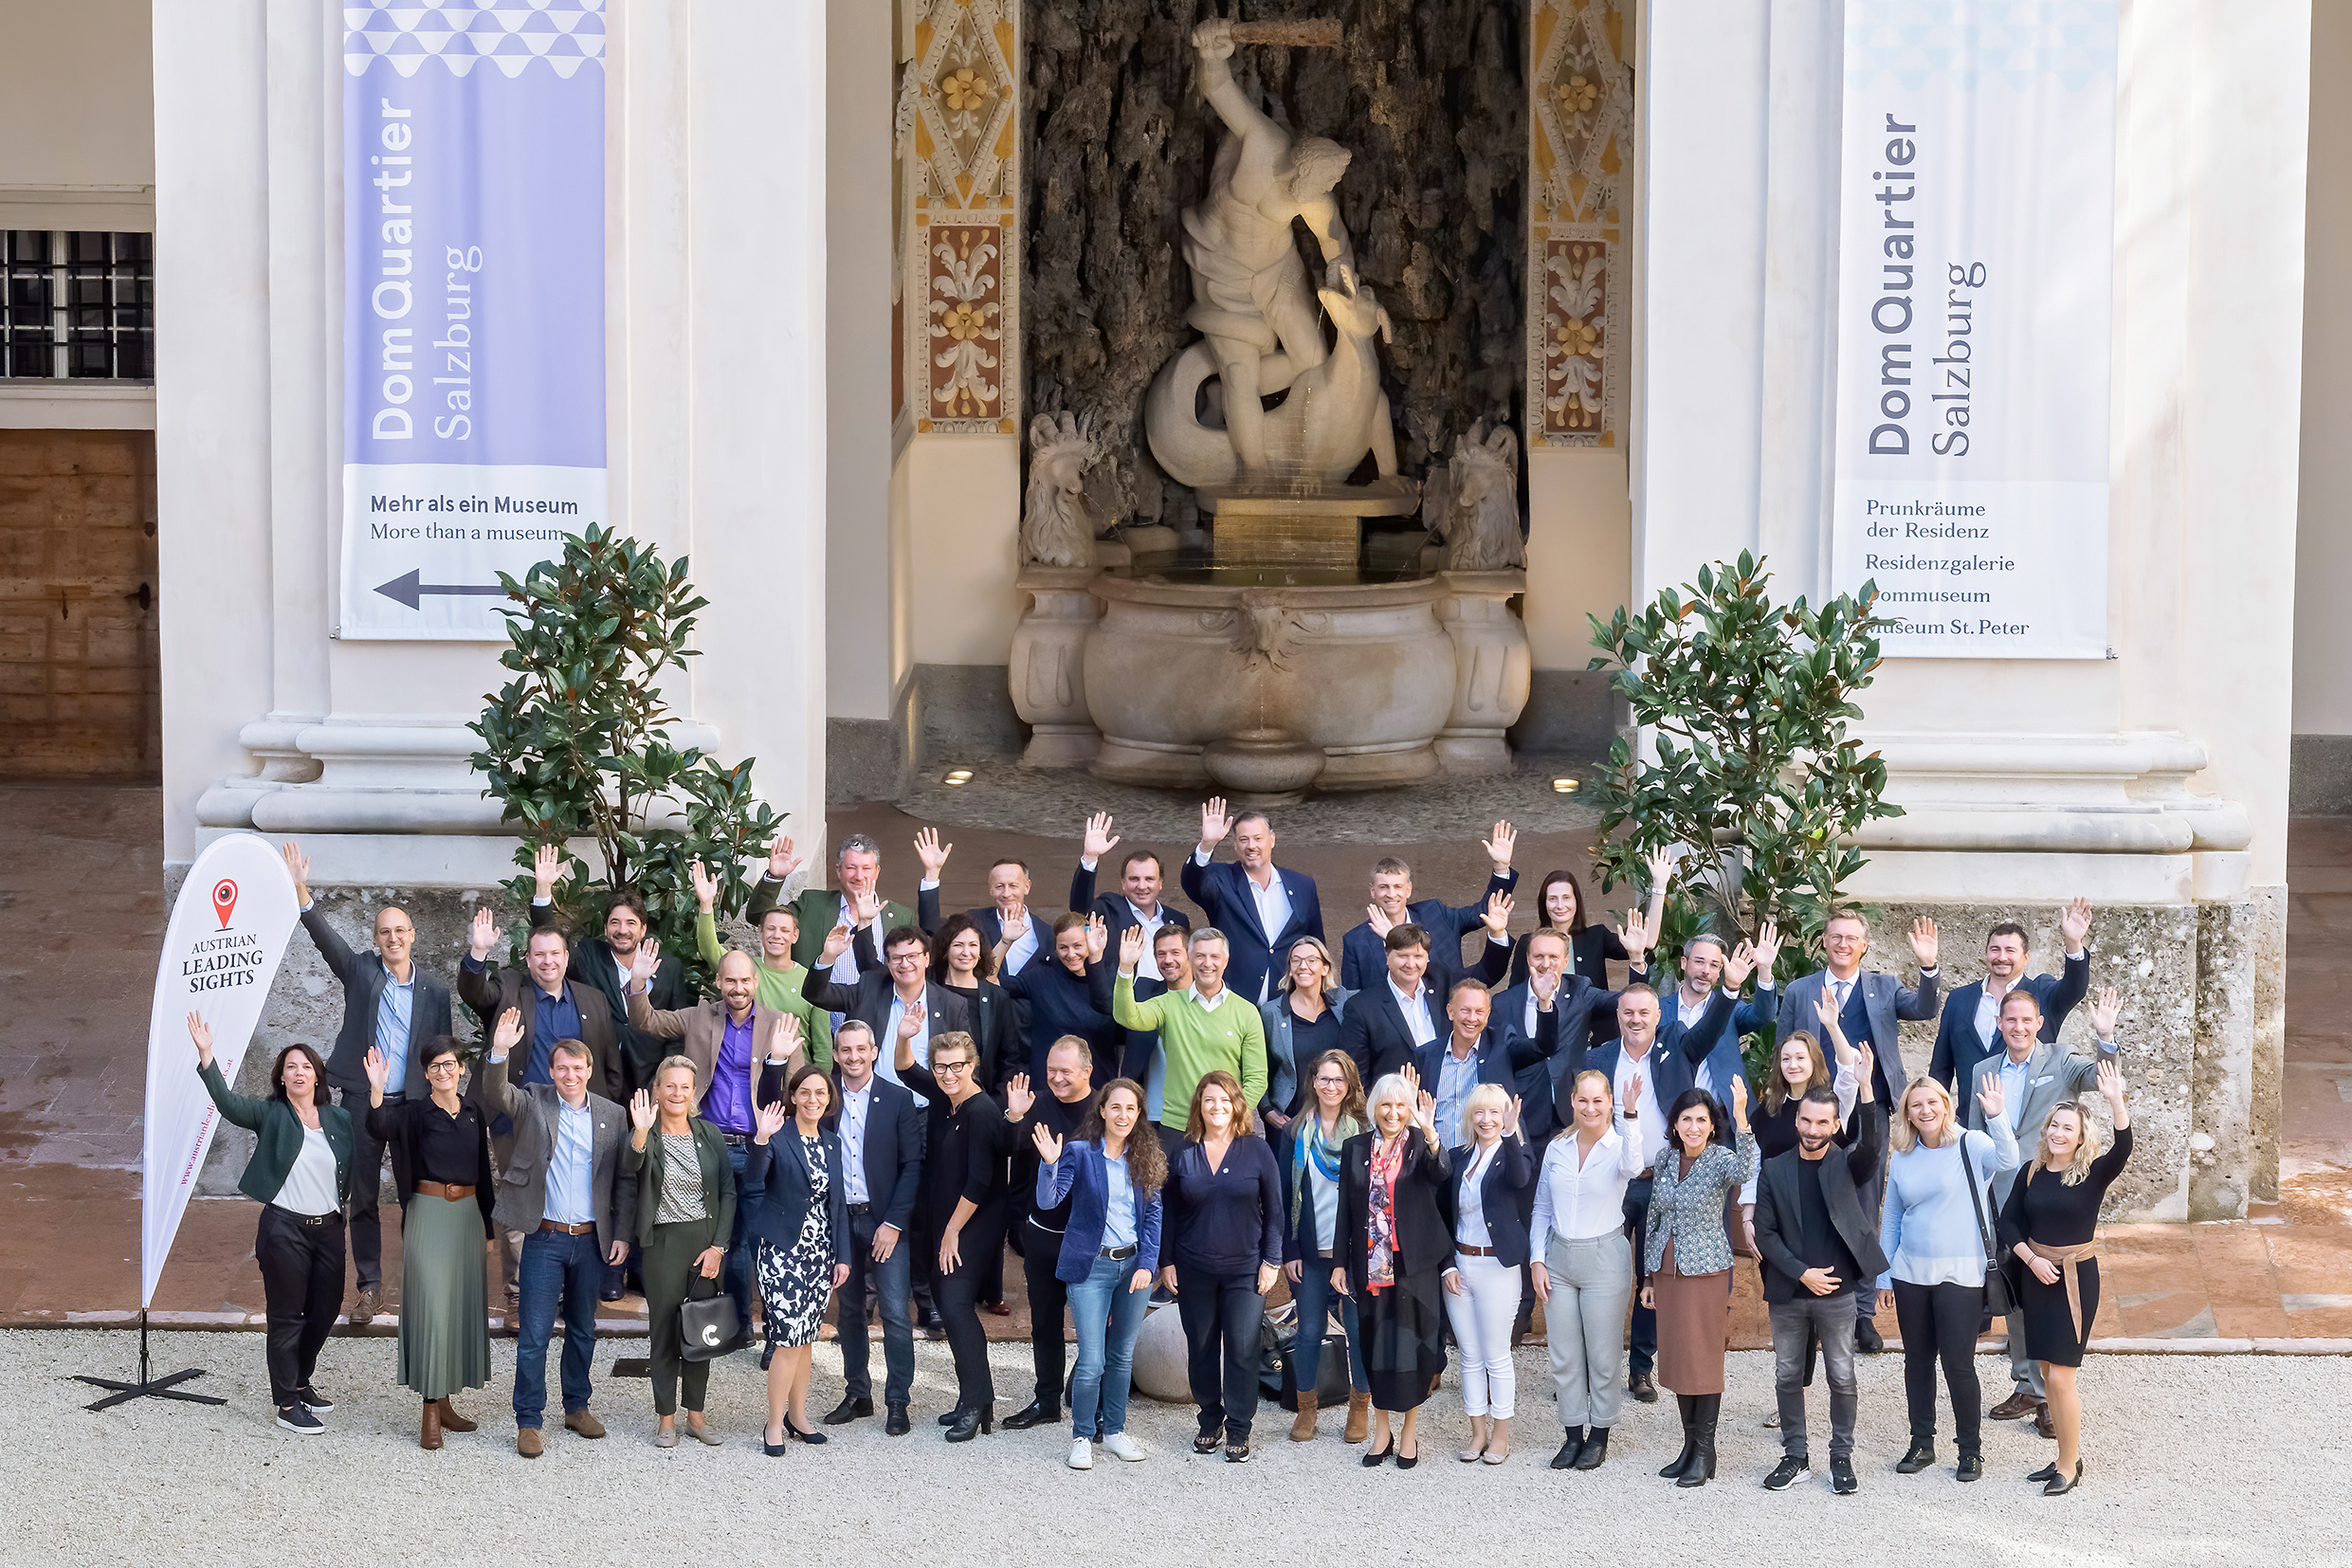 2nd Austrian Leading Sights Congress